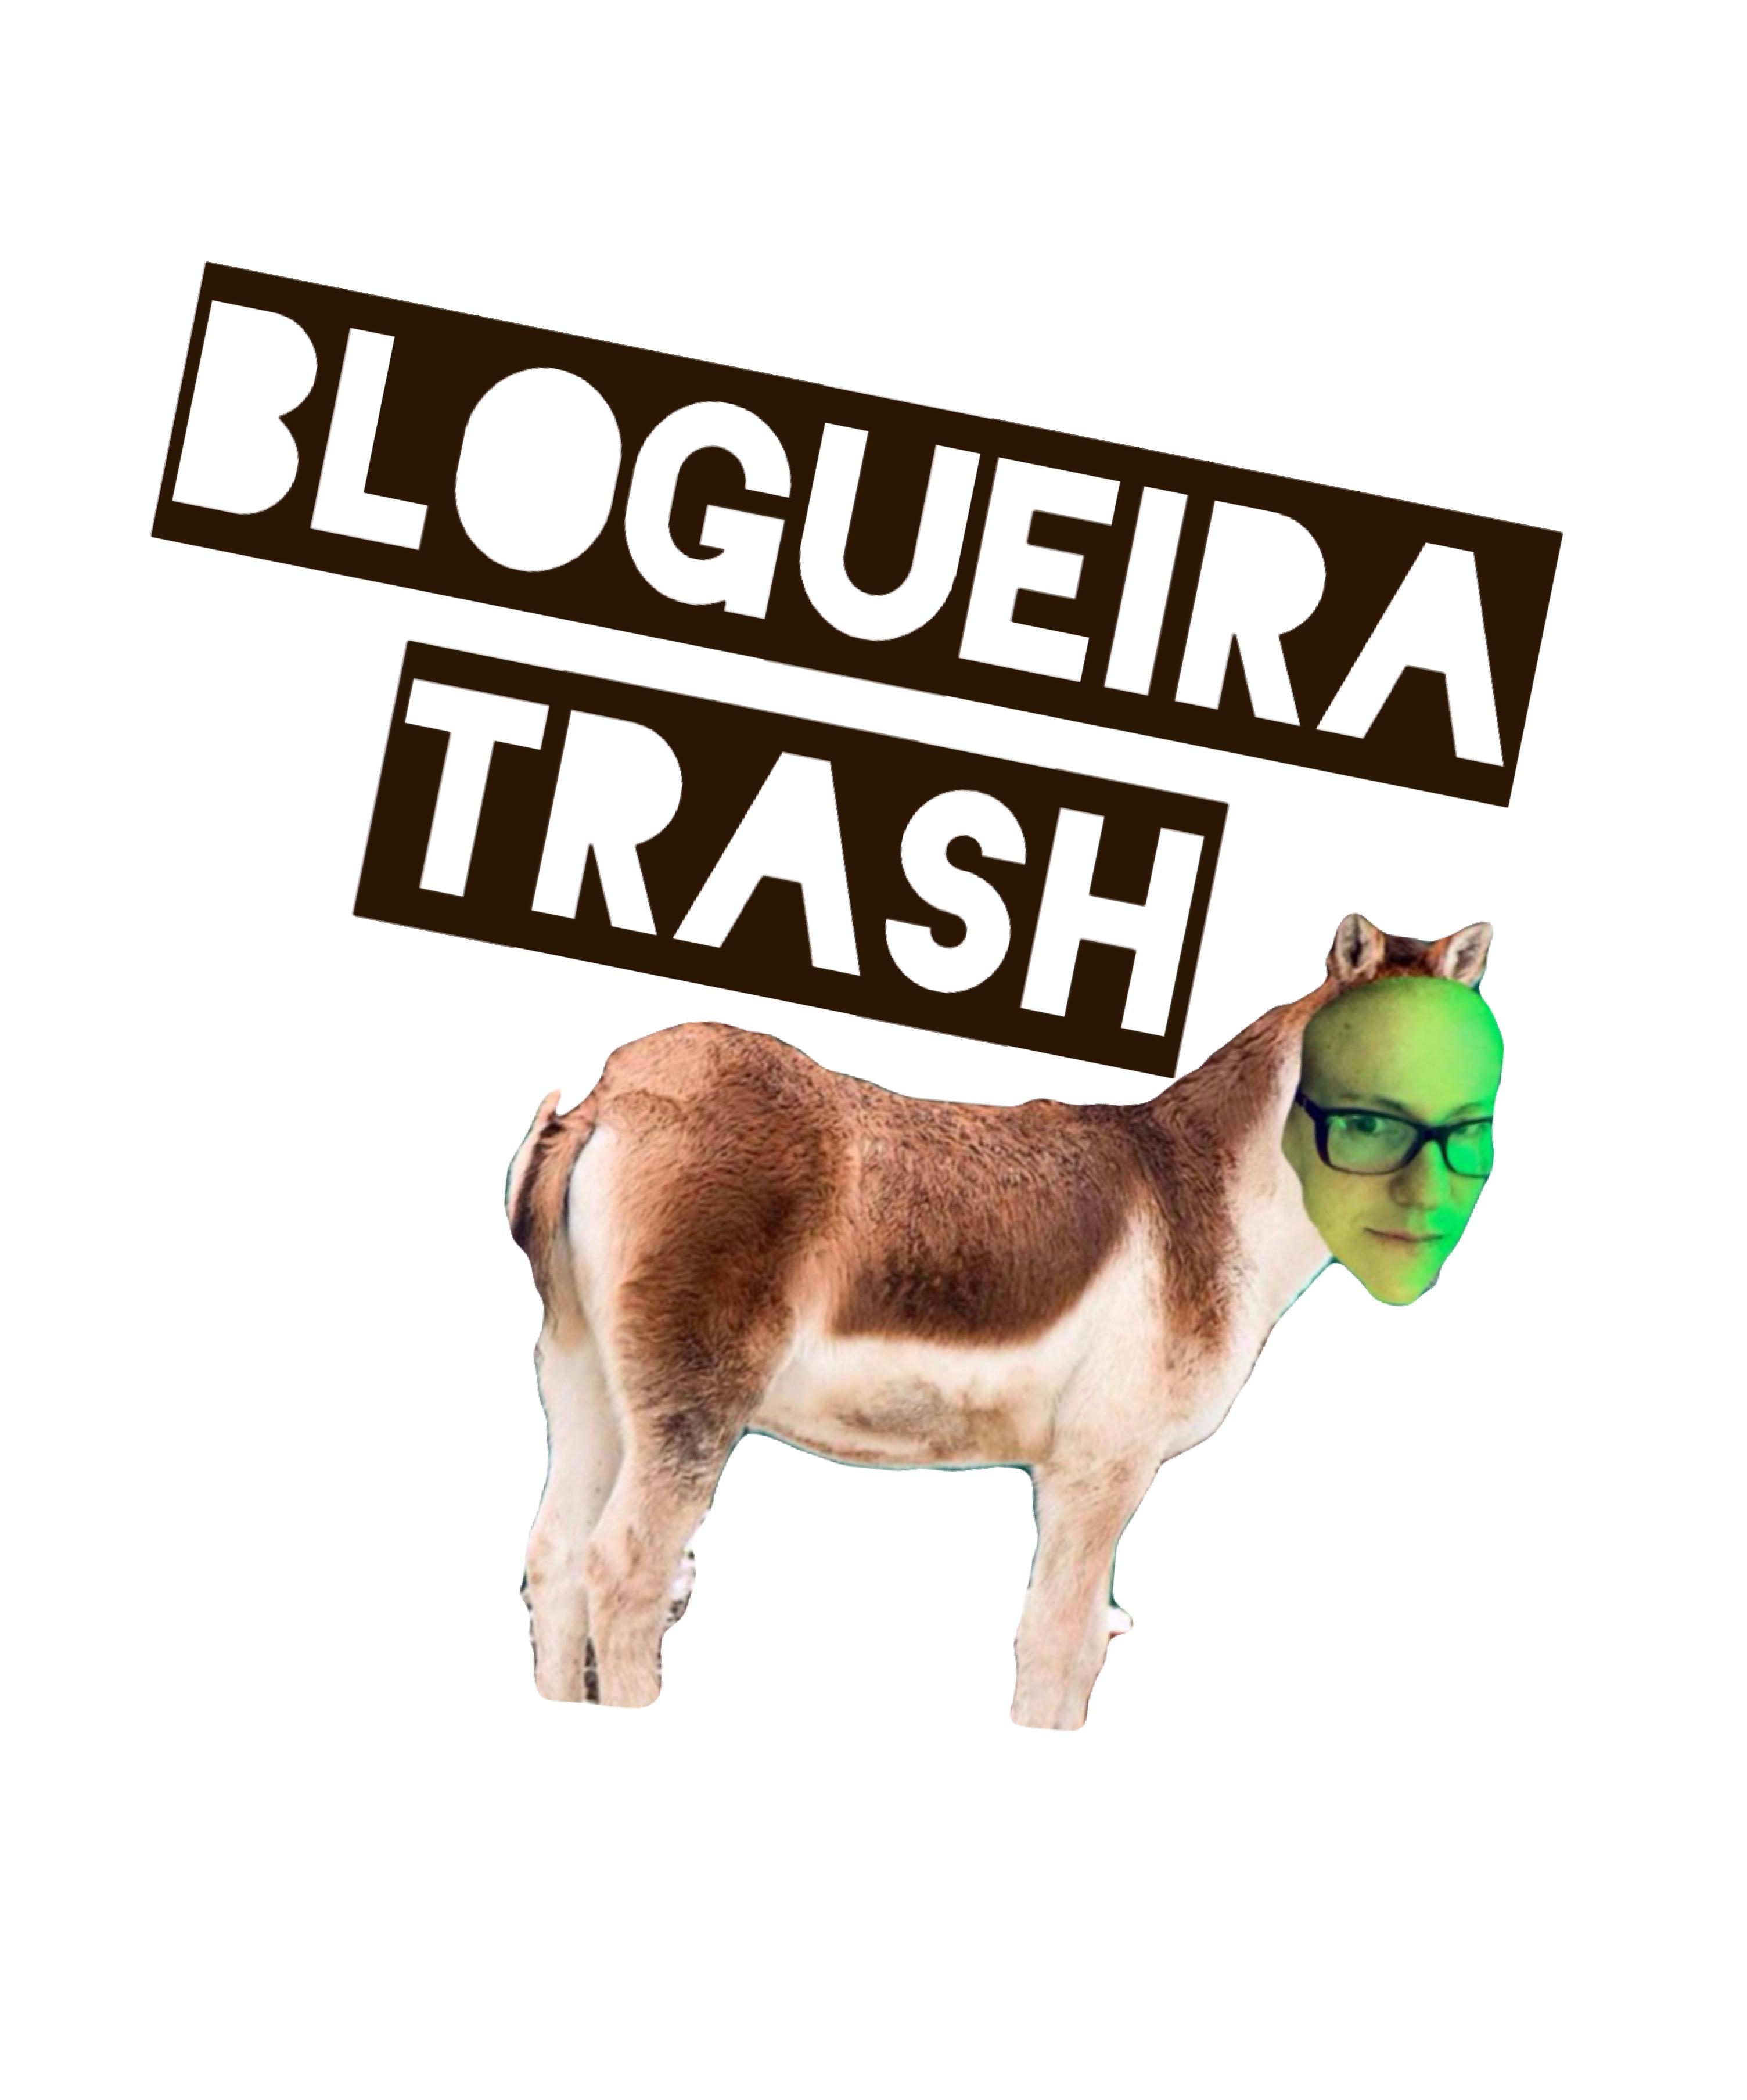 Blogueira Trash